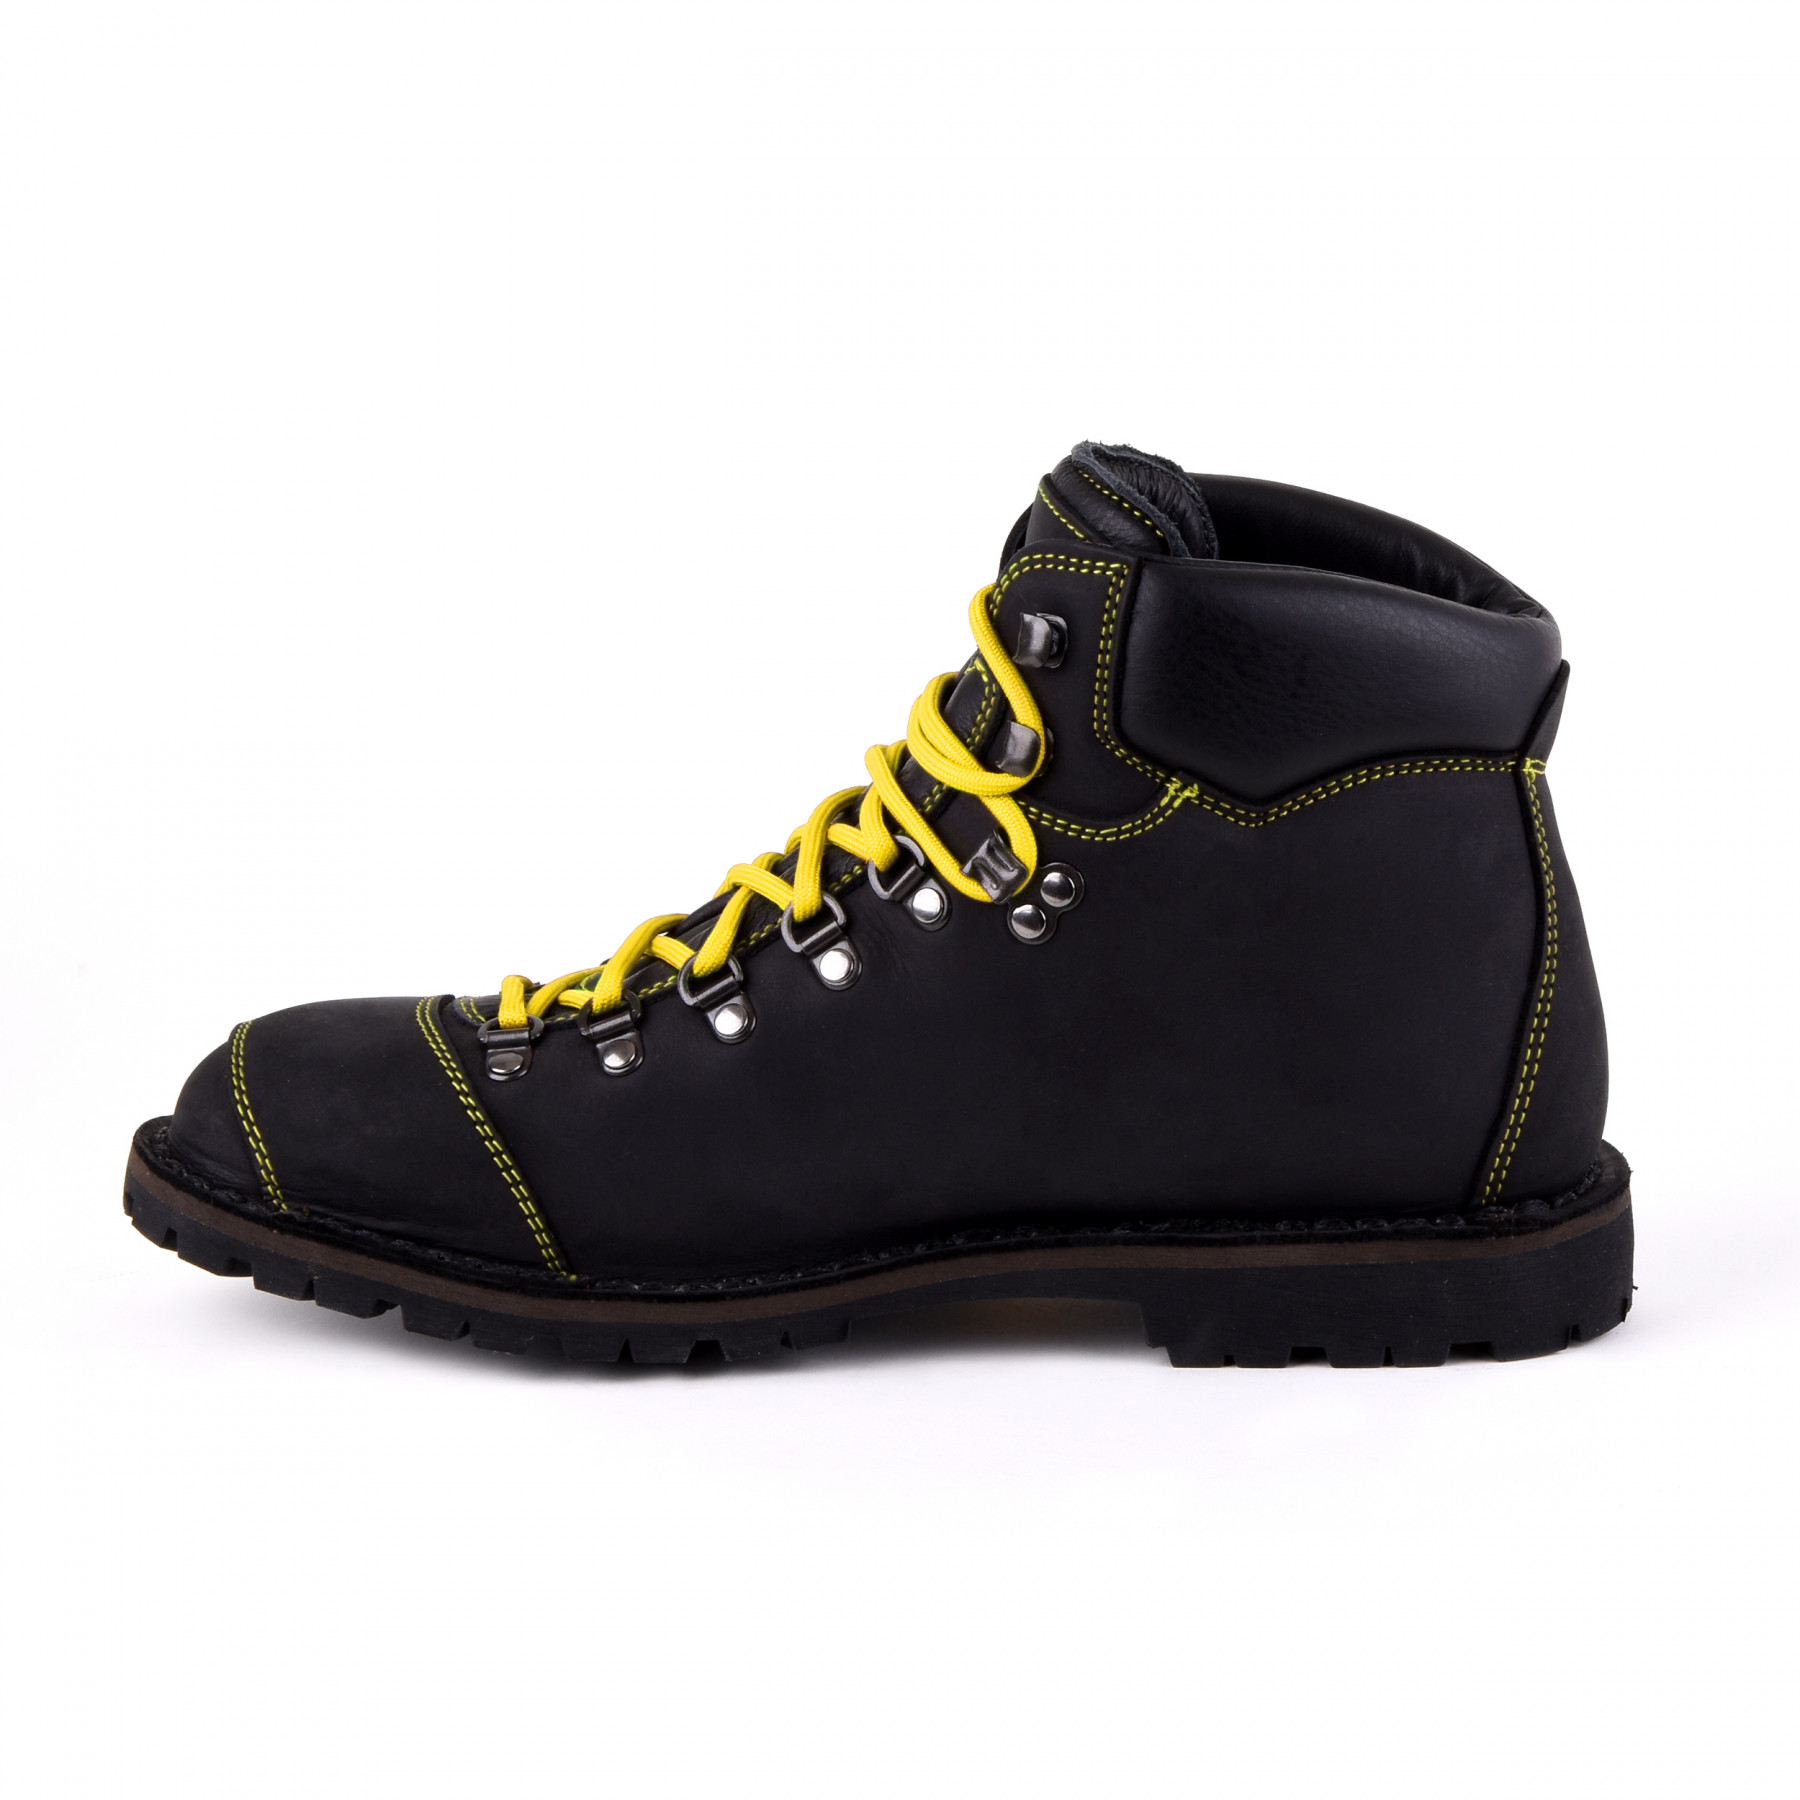 Biker Boot Adventure Denver Black, black gents boot, yellow stitching